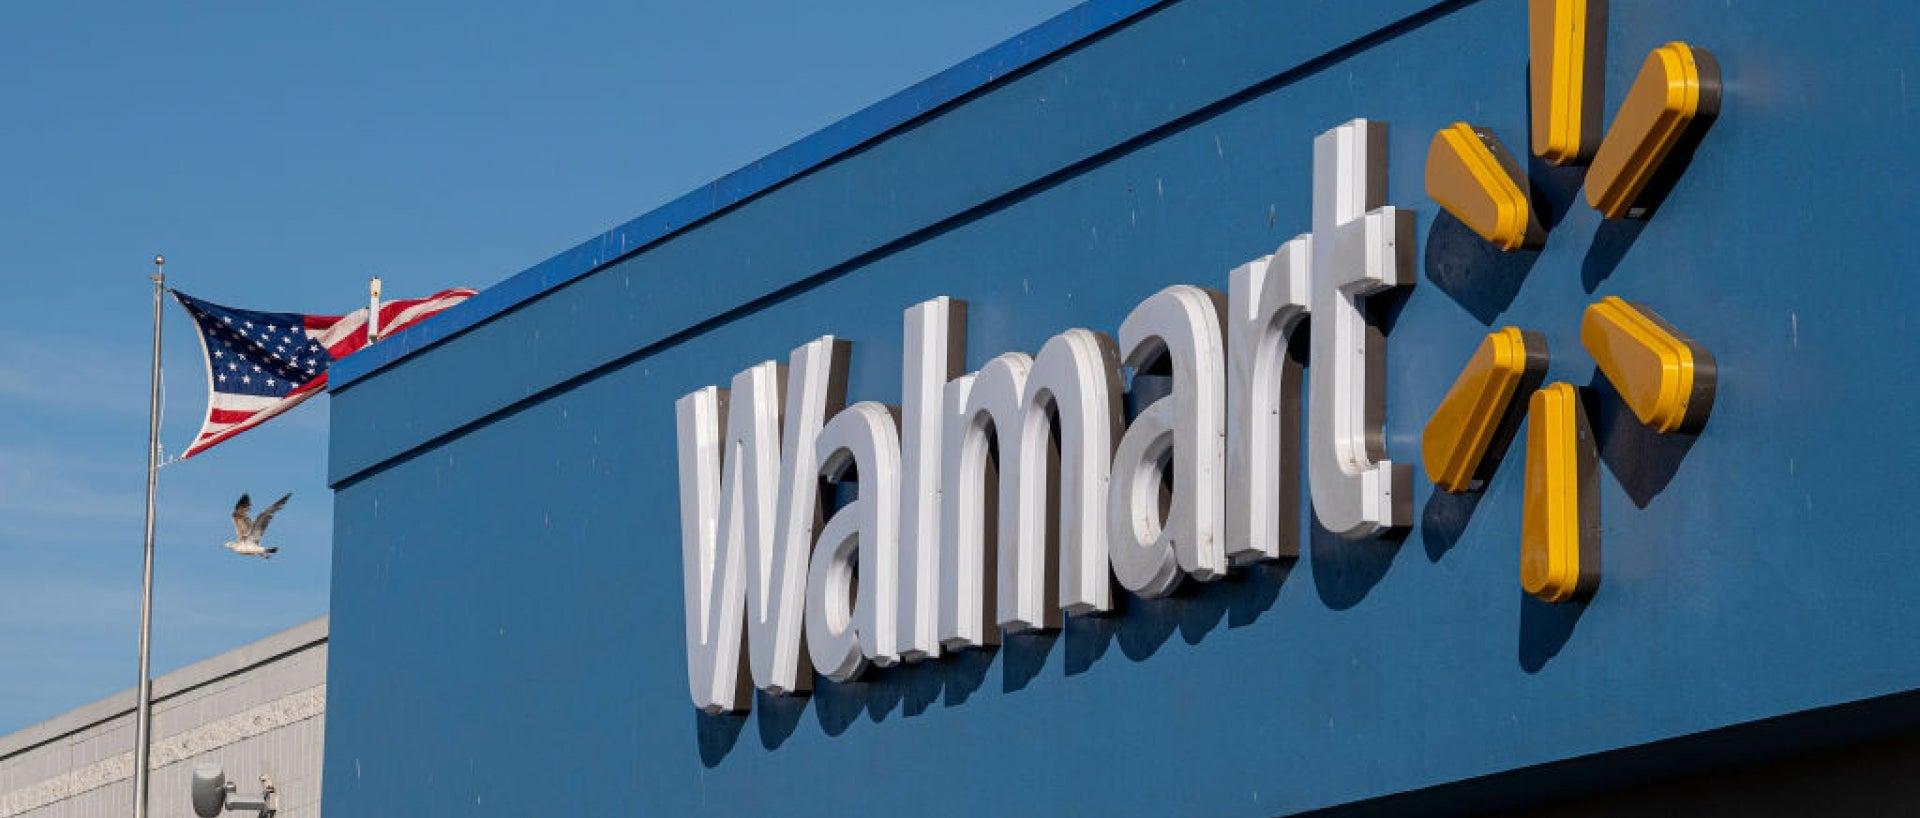 Up close shot of Walmart building sign